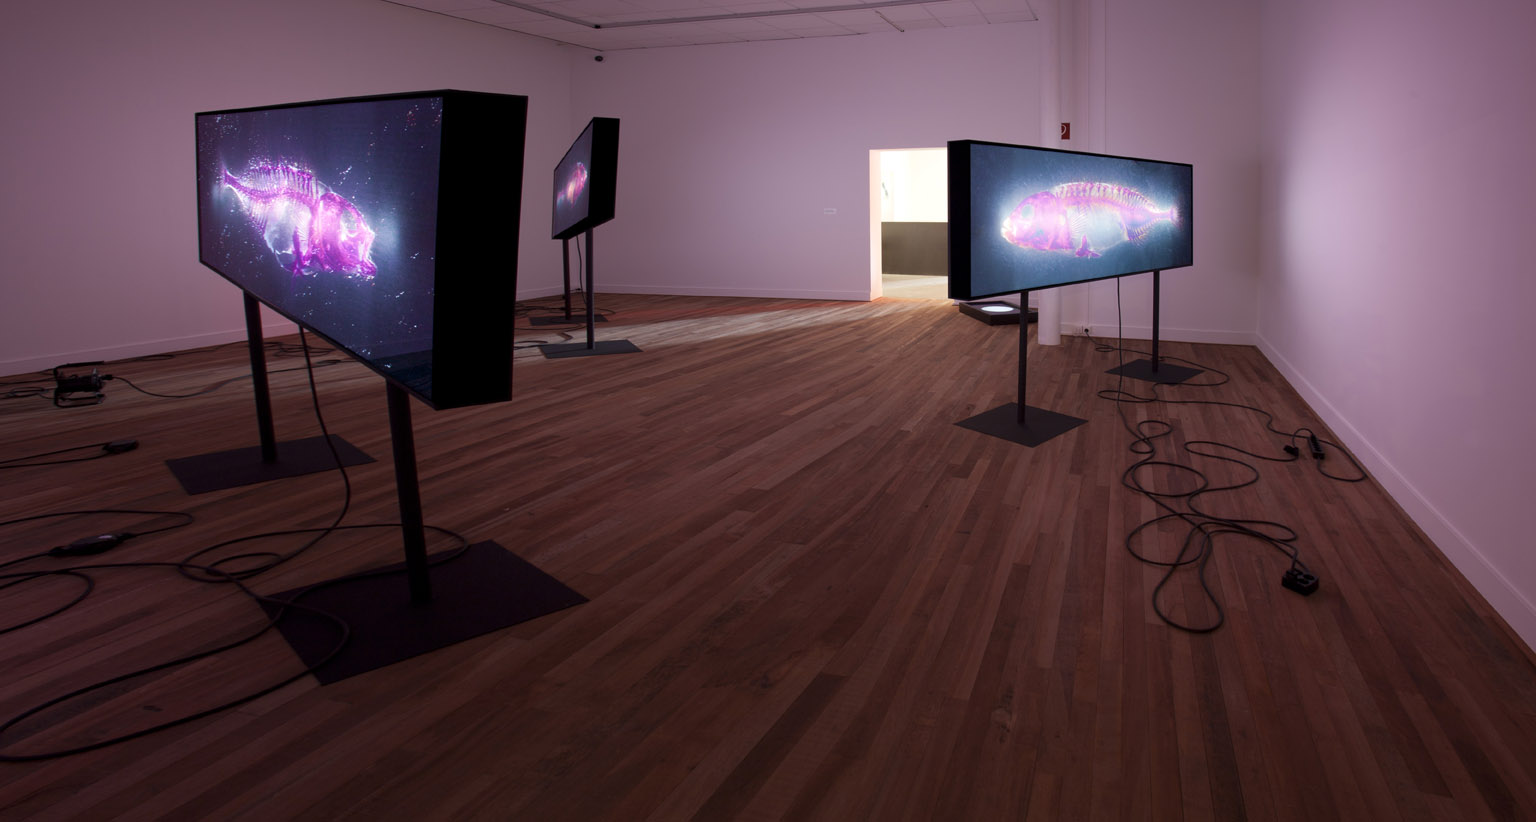 Ti-tâne, Brandon Ballengée, Museum Het Domein, 2014.